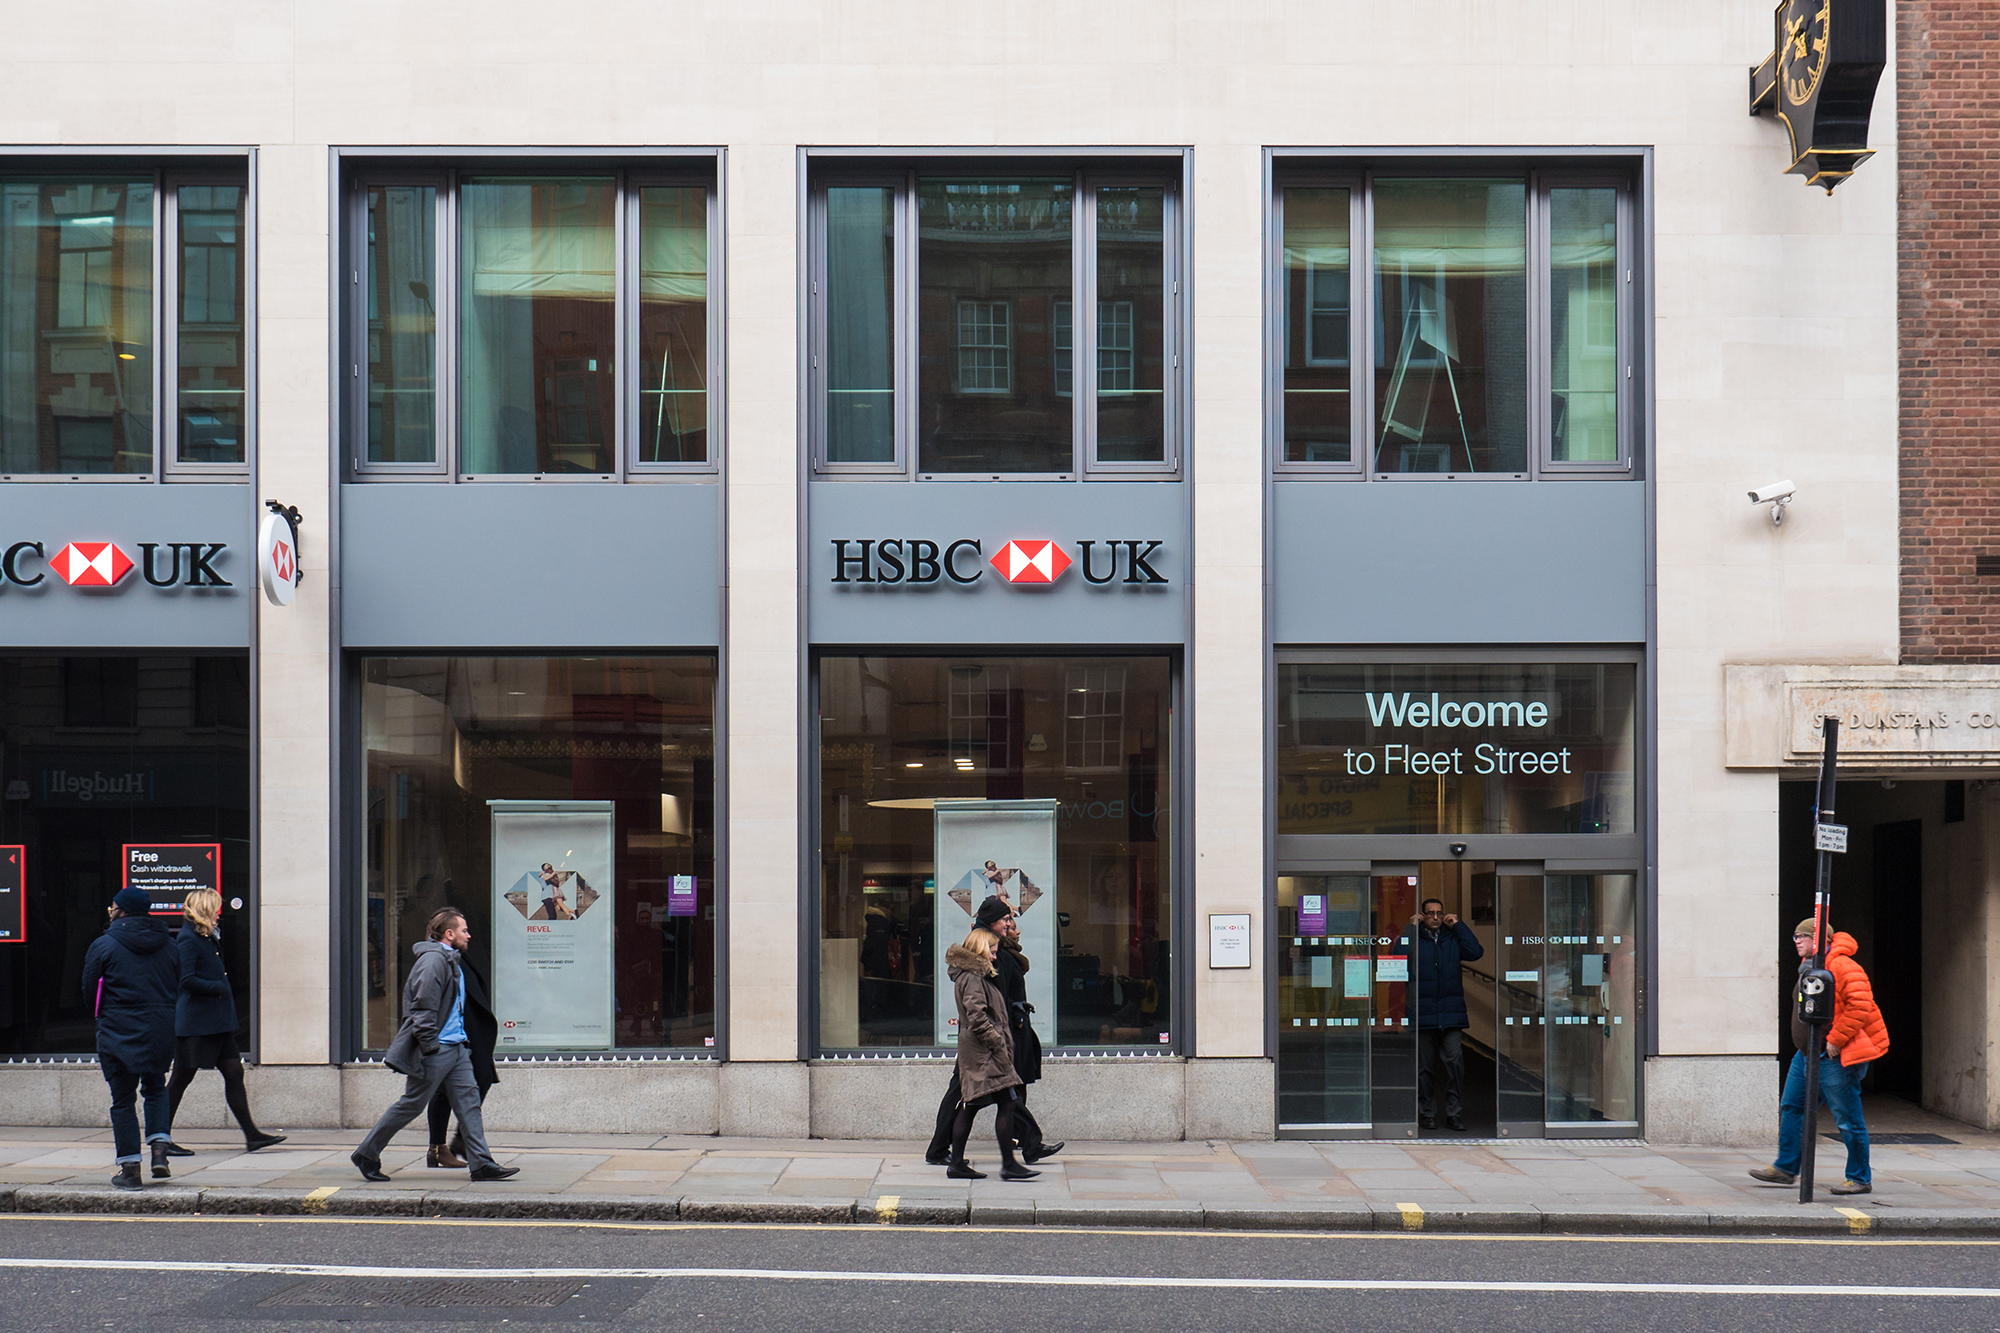 HSBC branch. (Image: pio3/Shutterstock)